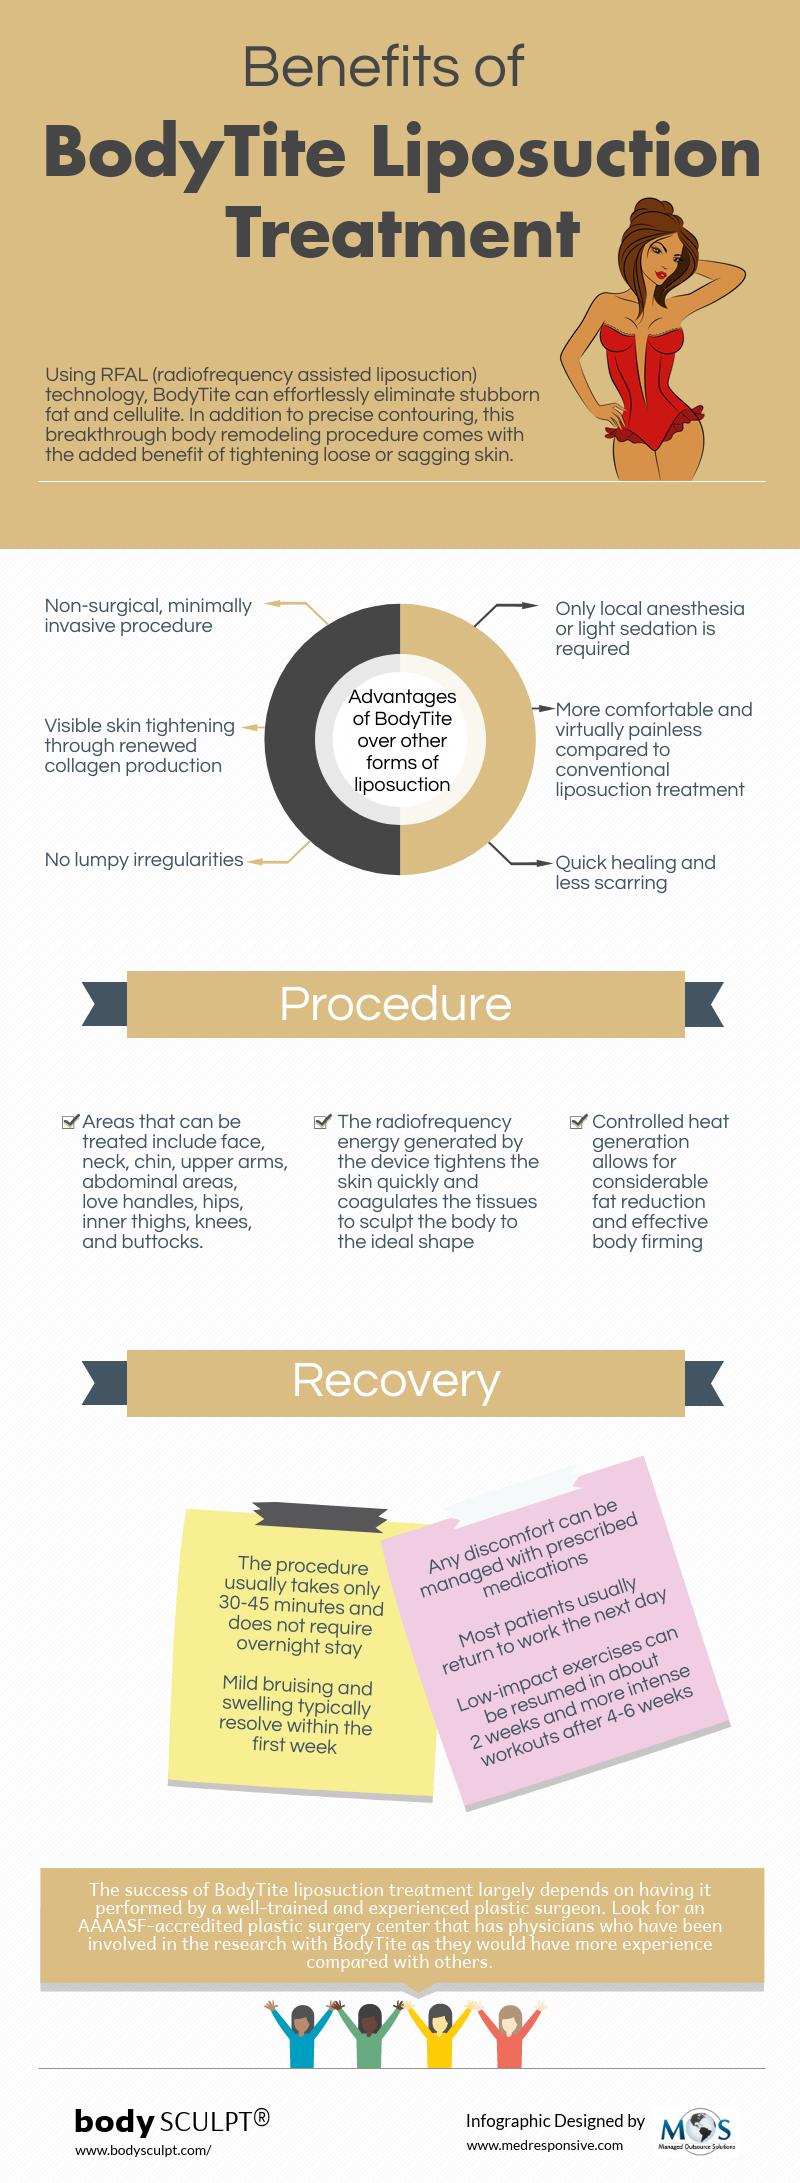 Benefits of BodyTite Liposuction Treatment